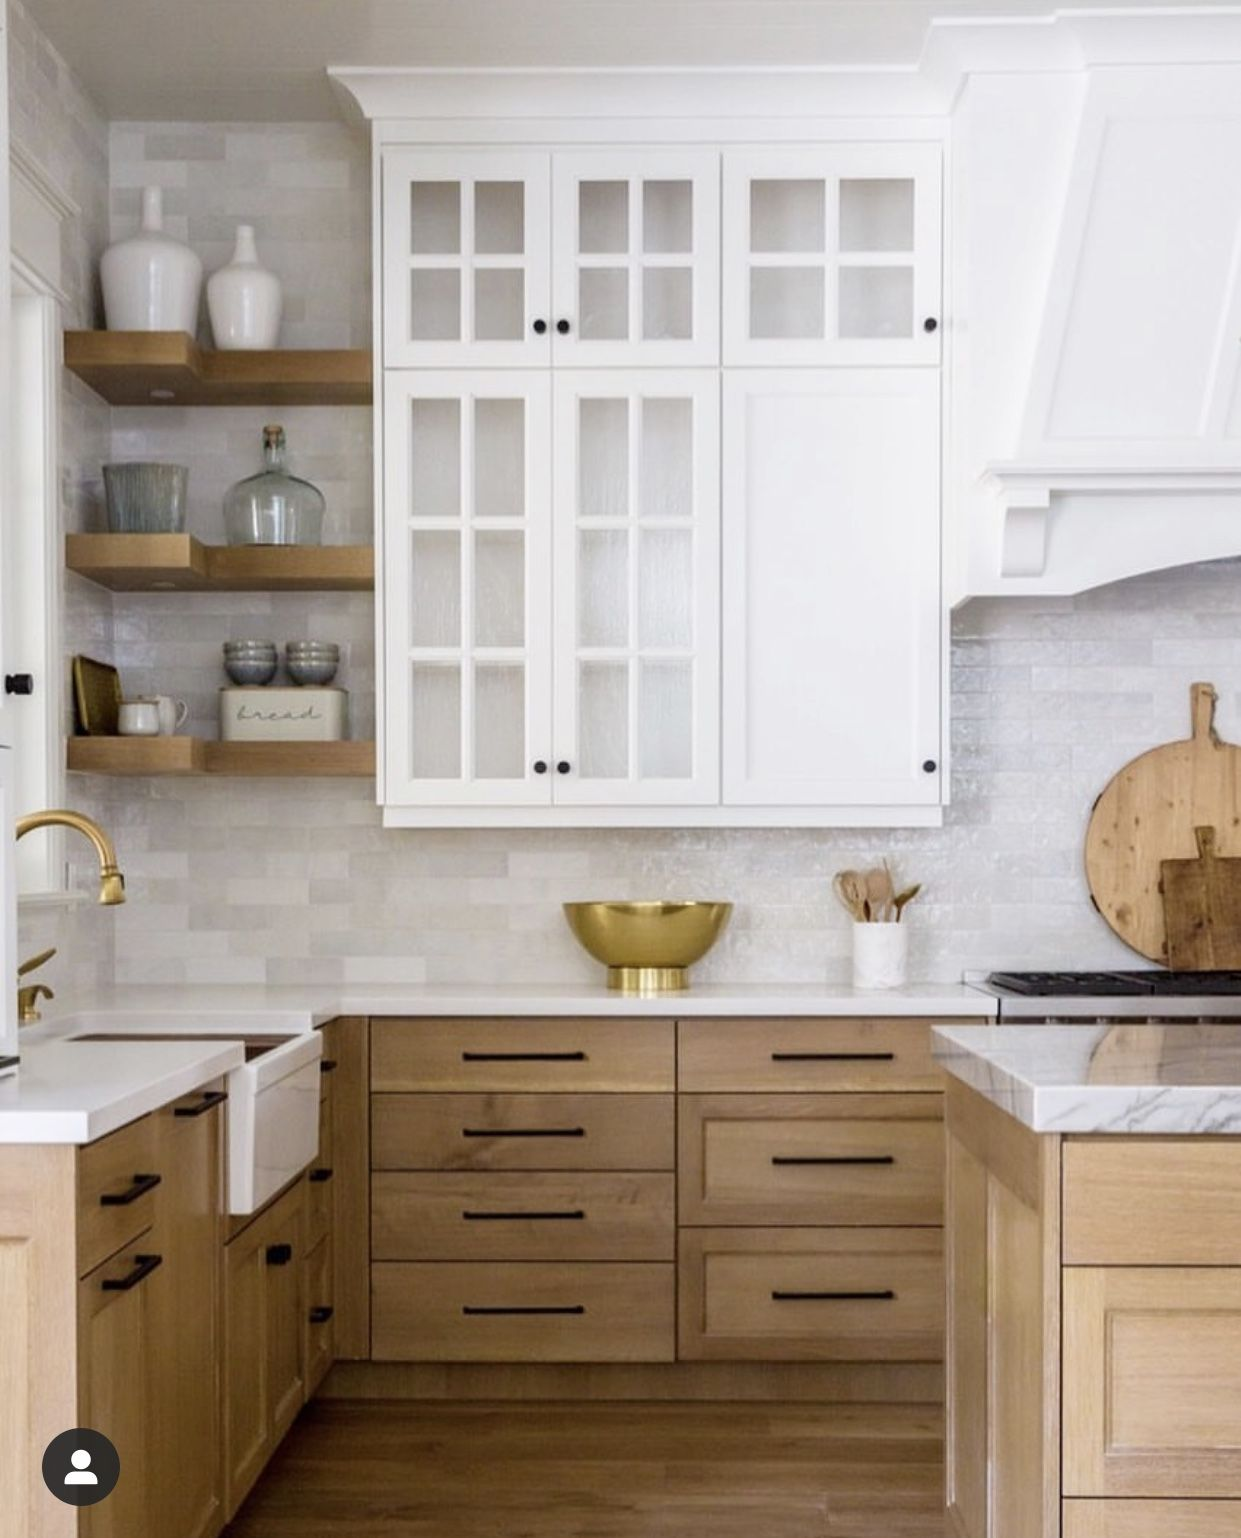 Wood Grain Cabinets Kitchen Design Kitchen Inspirations Home Kitchens